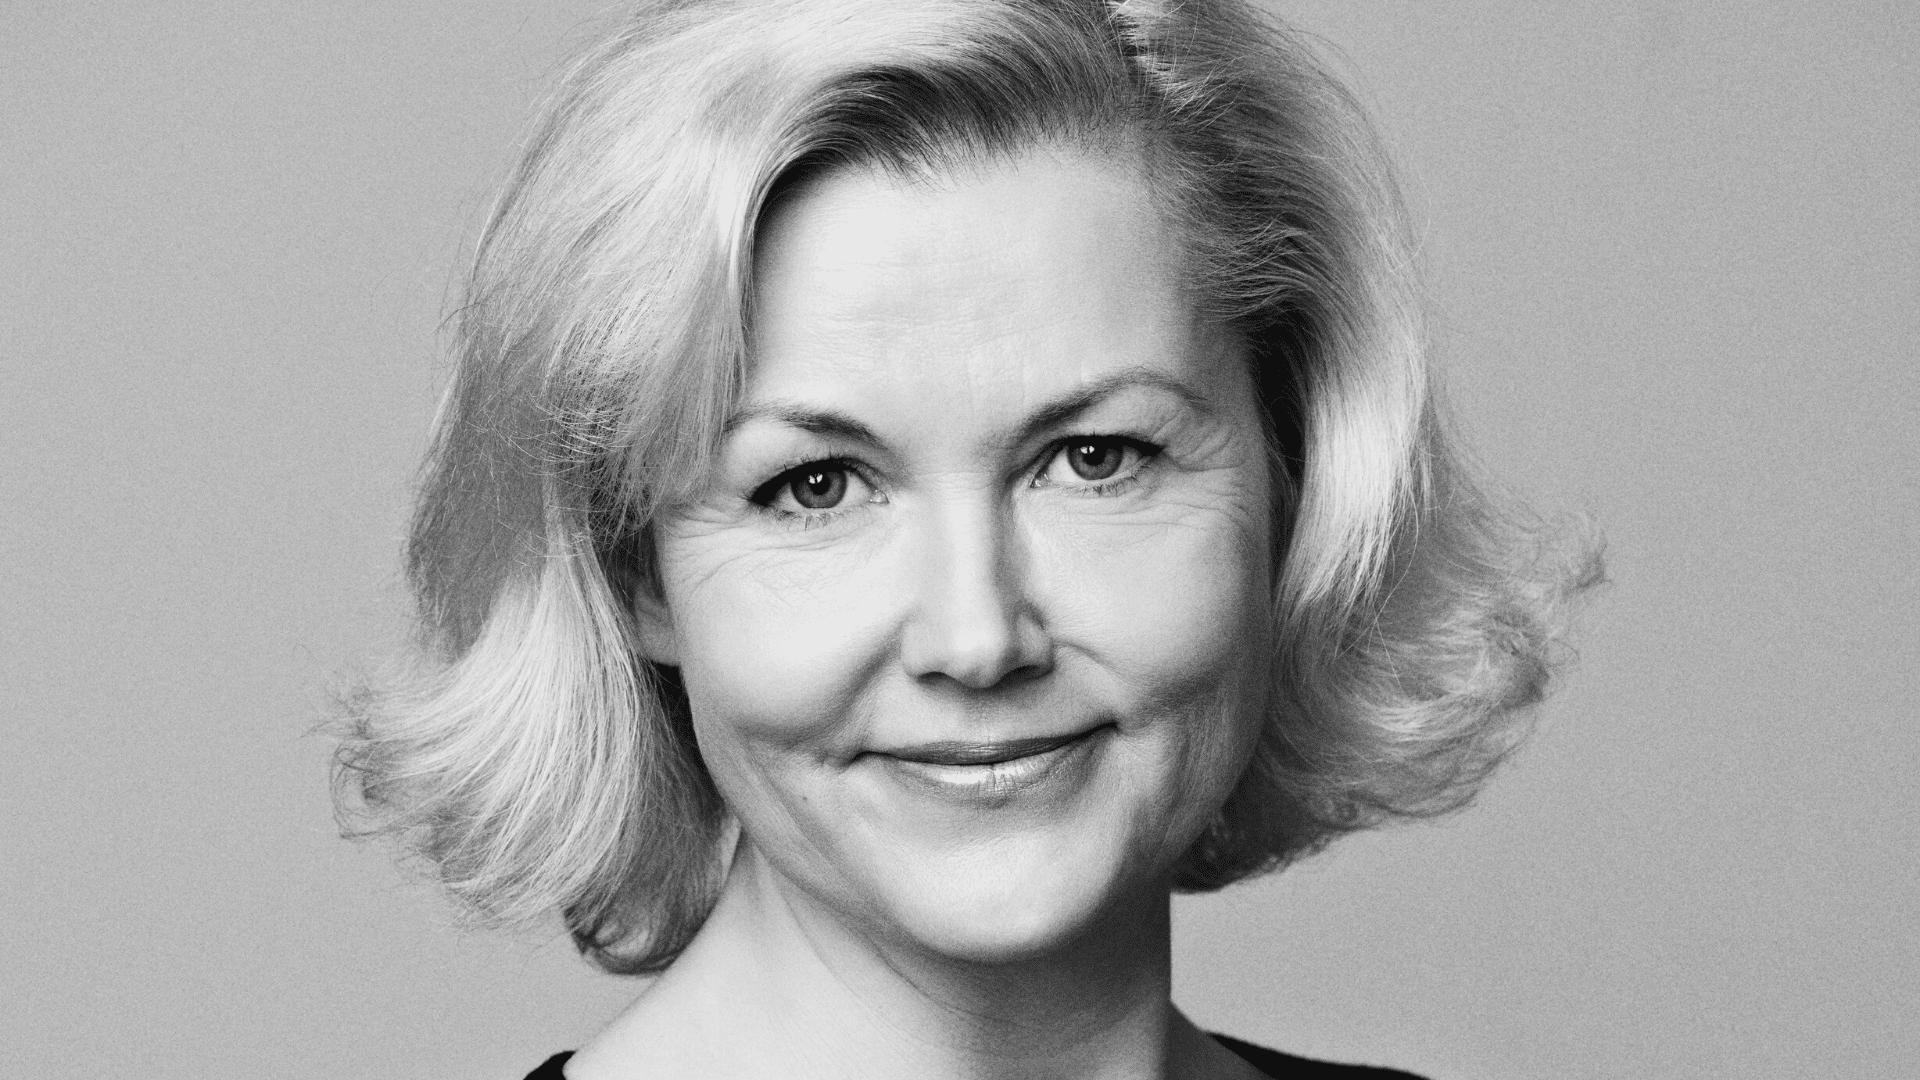 Anne-Marie Vedsø Olesen, Månen over Øen